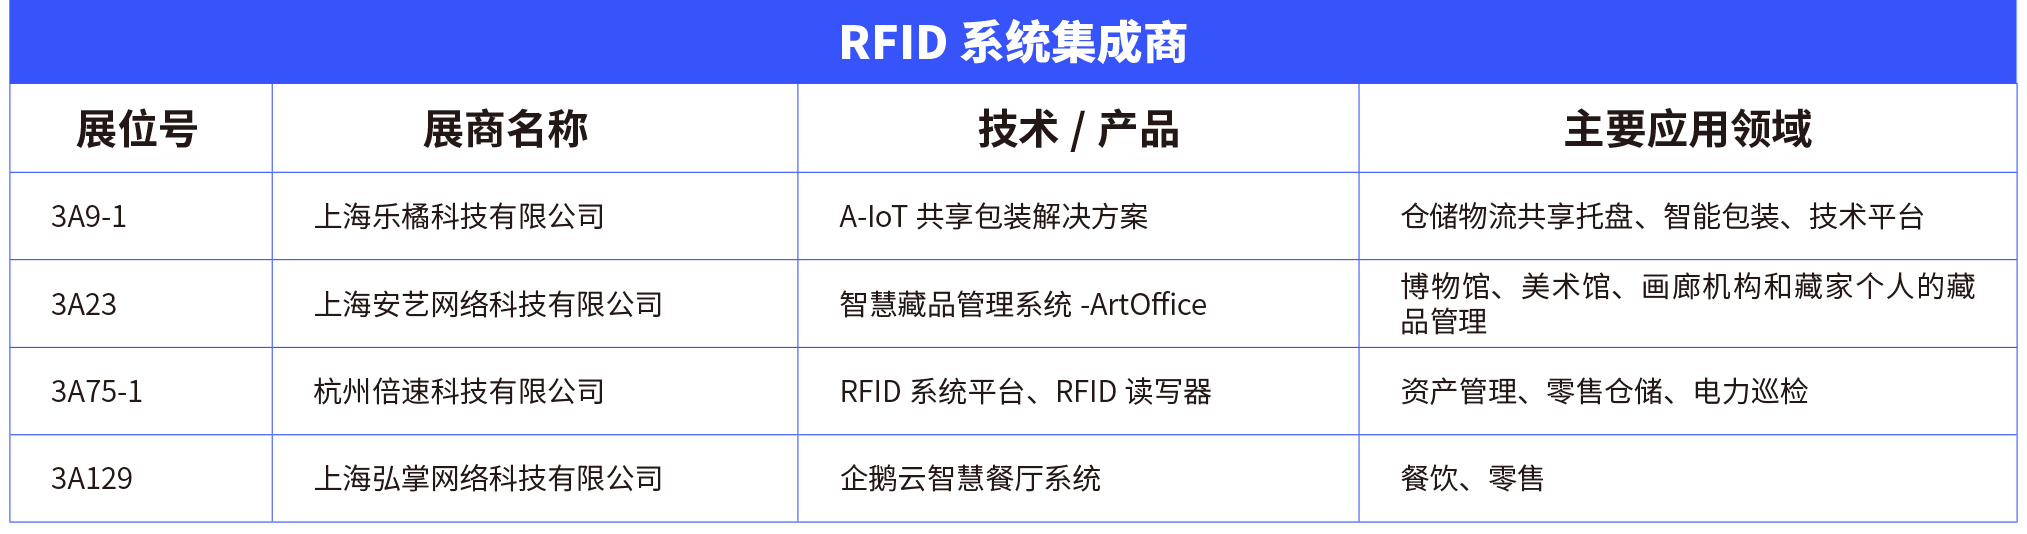 rfid系统集成商